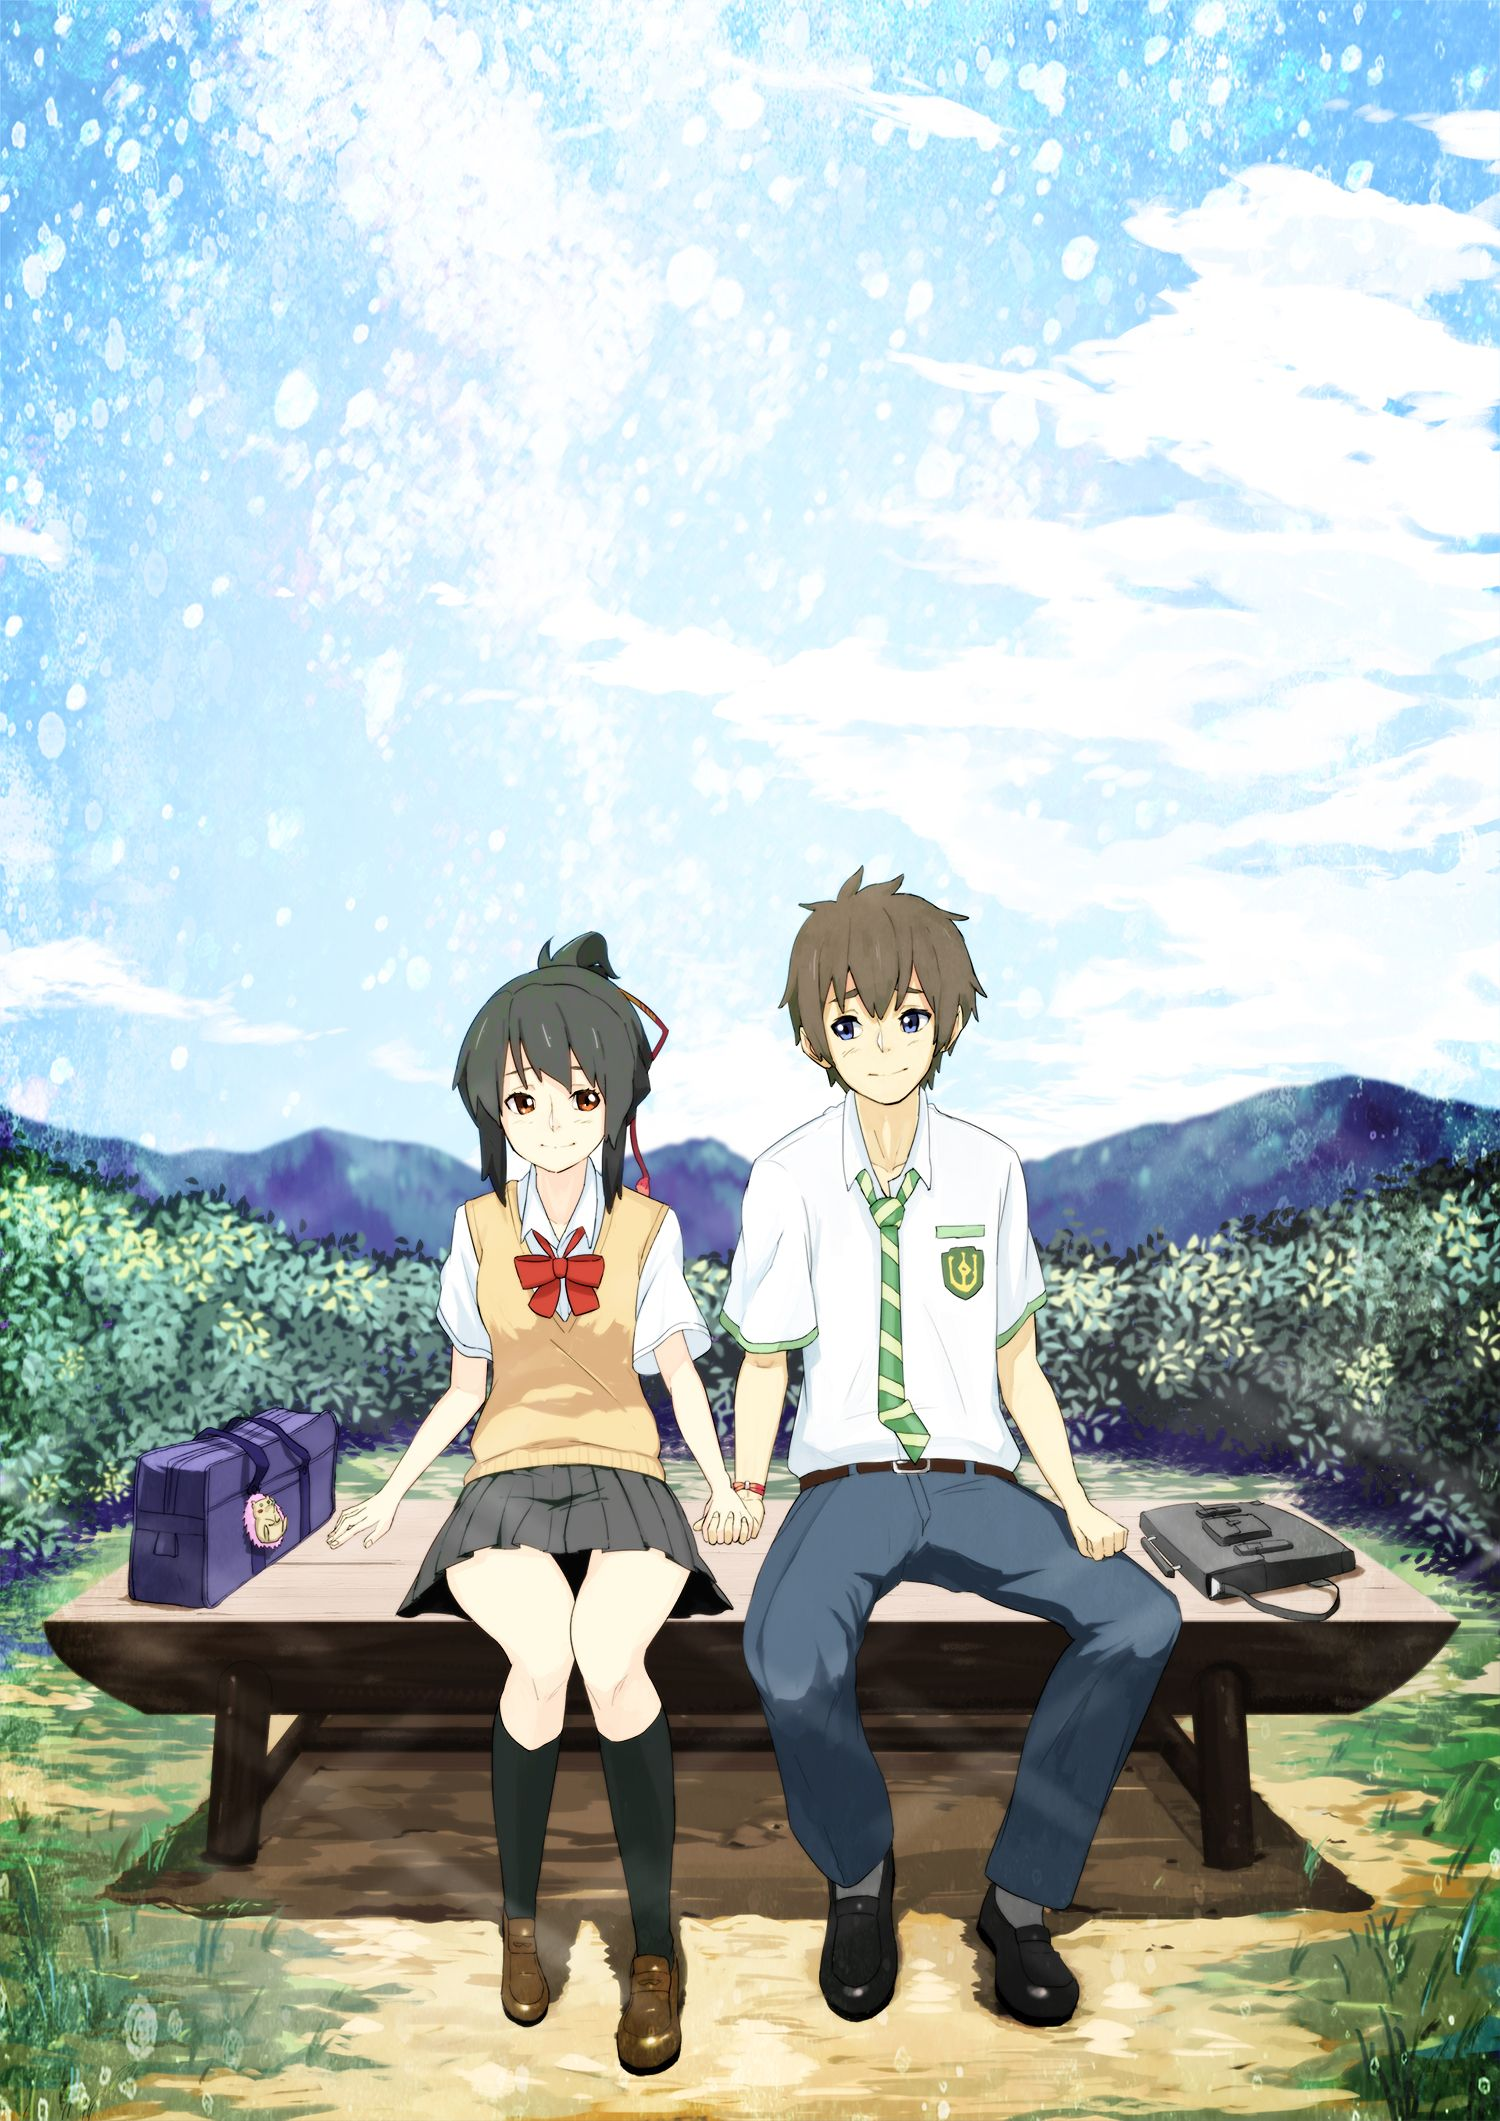 Kimi no nawa Kimi no nawa(your name) Pinterest Anime